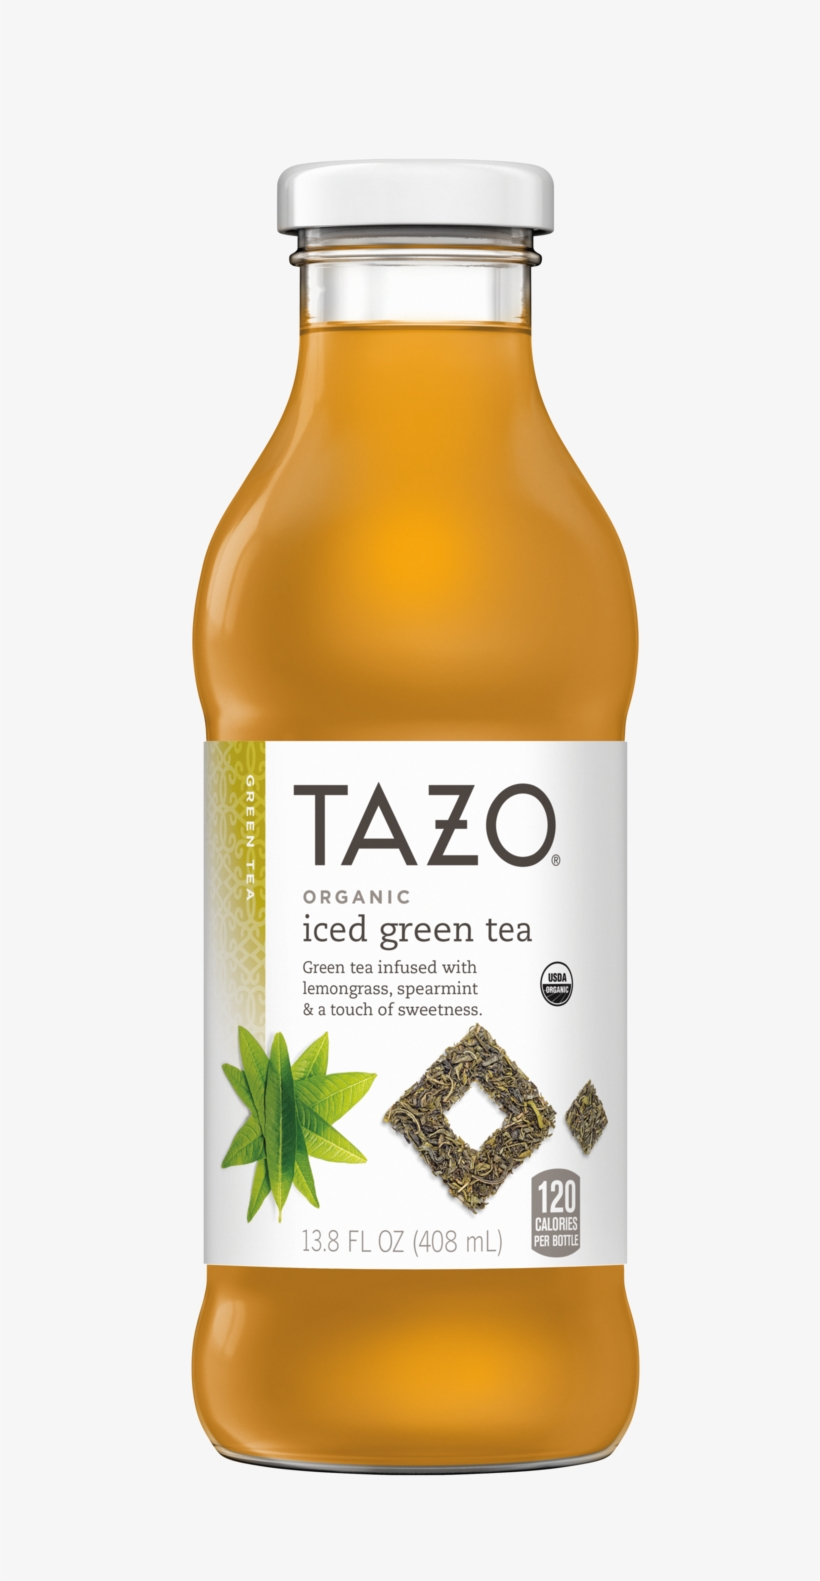 Organic Iced Green Tea Bottle Tazo Tea Png Zen Iced - Tazo Organic Iced Green Tea - 13.8 Fl Oz Bottle, transparent png #454948